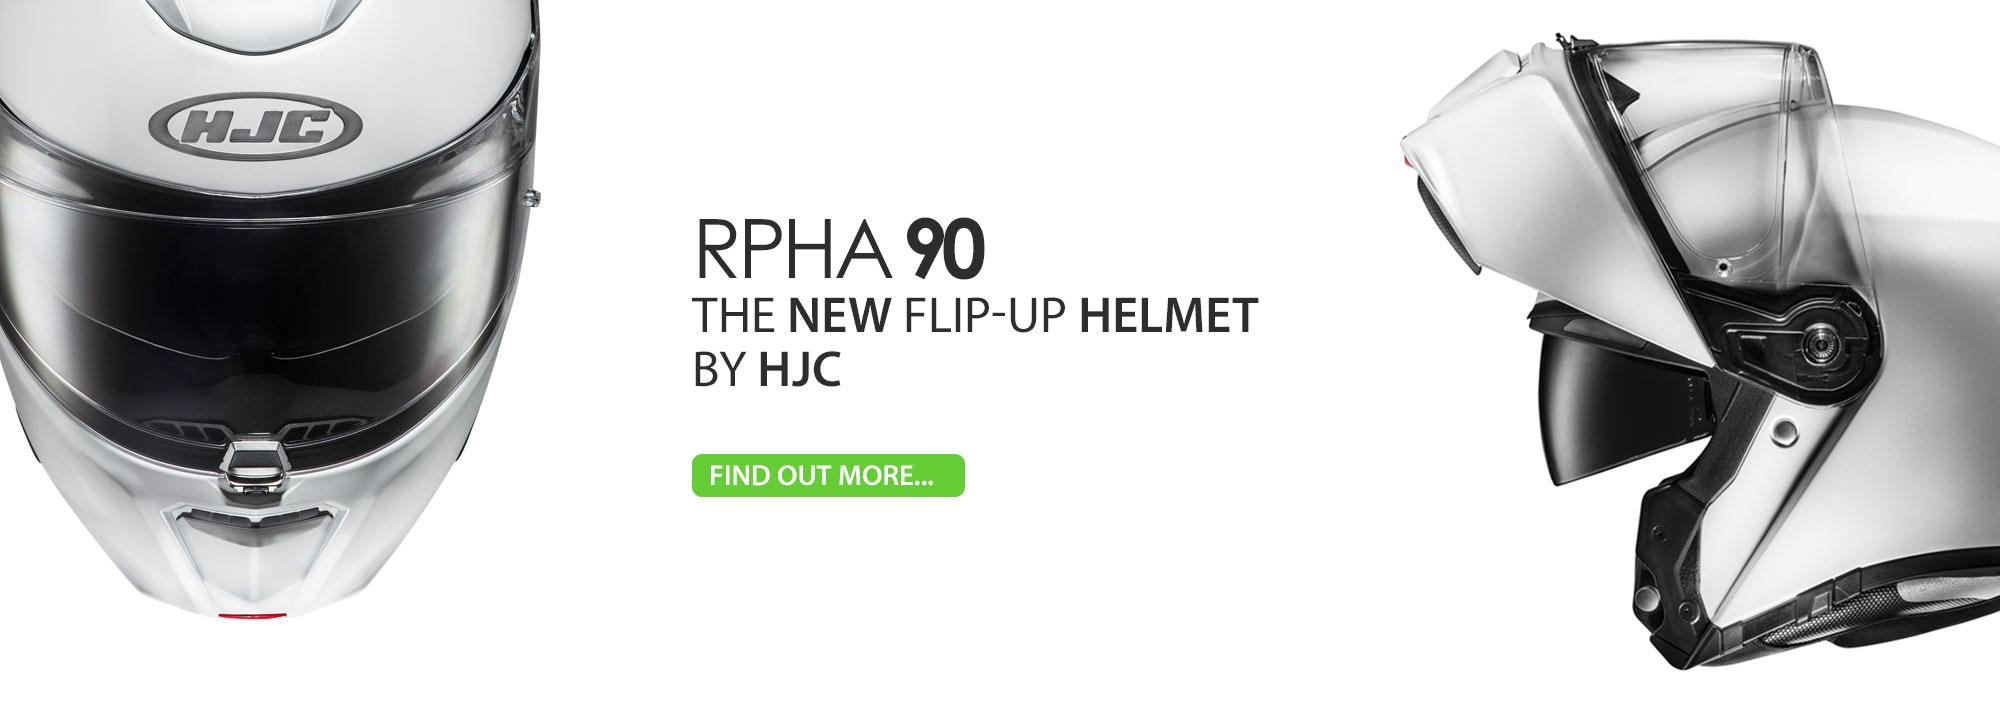 RPHA 90